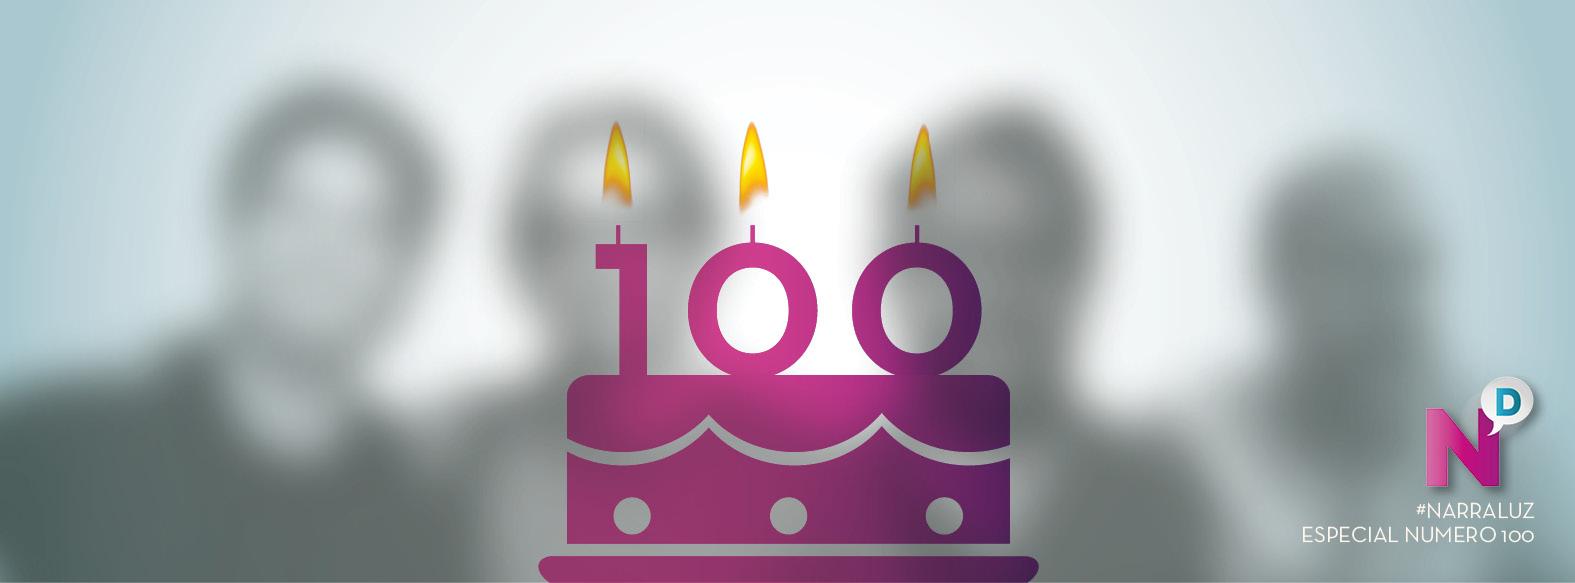 portadawebnarraluz100